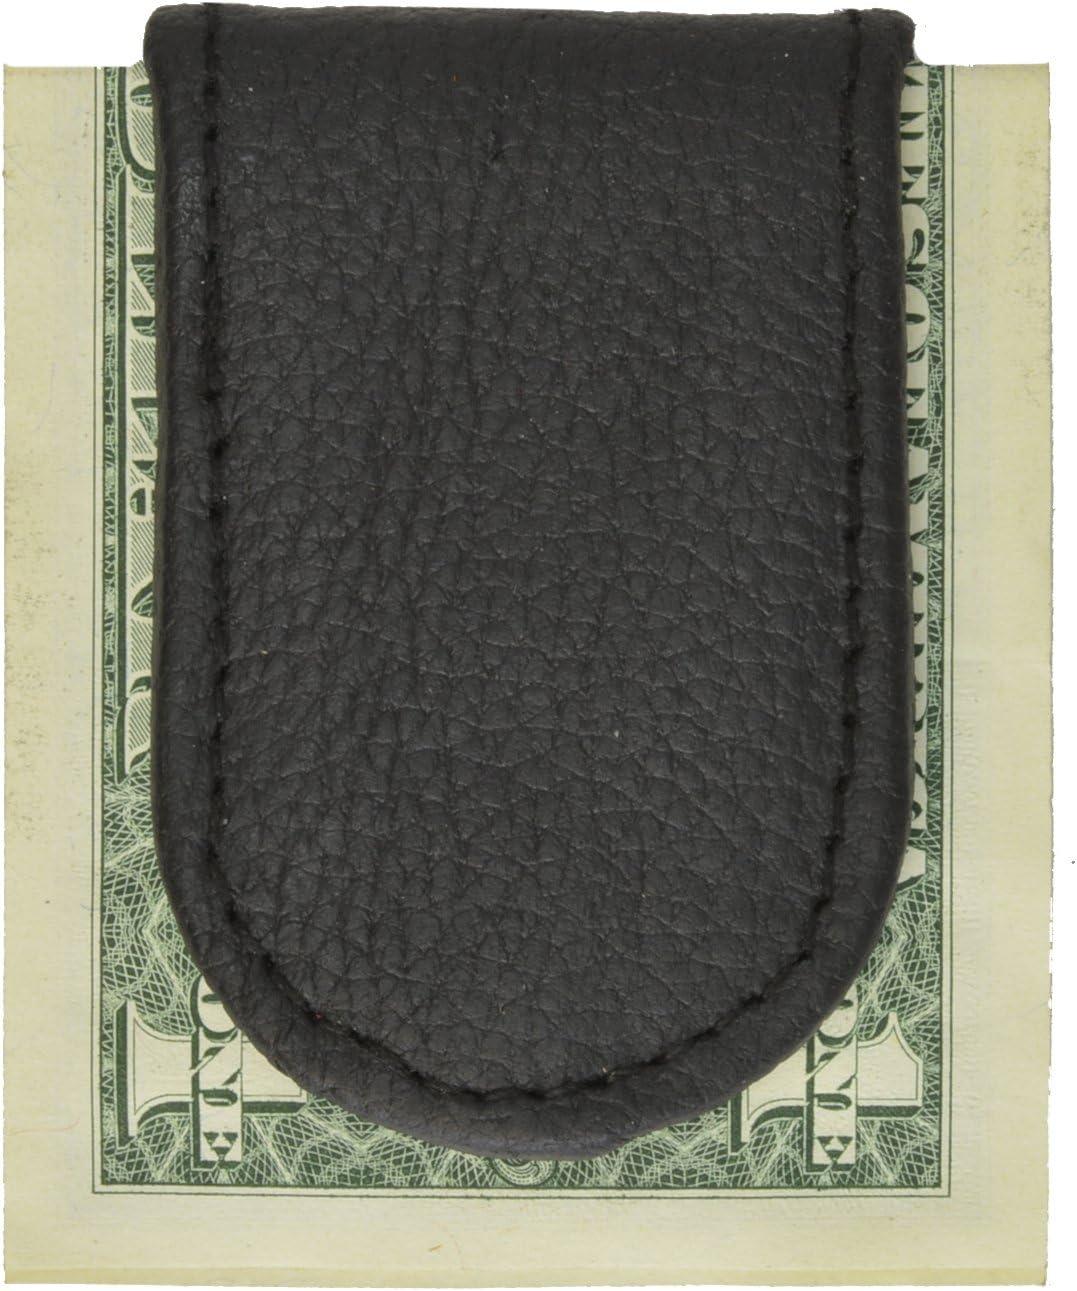 New Magnetic Billfold Money Clip Black #812CF